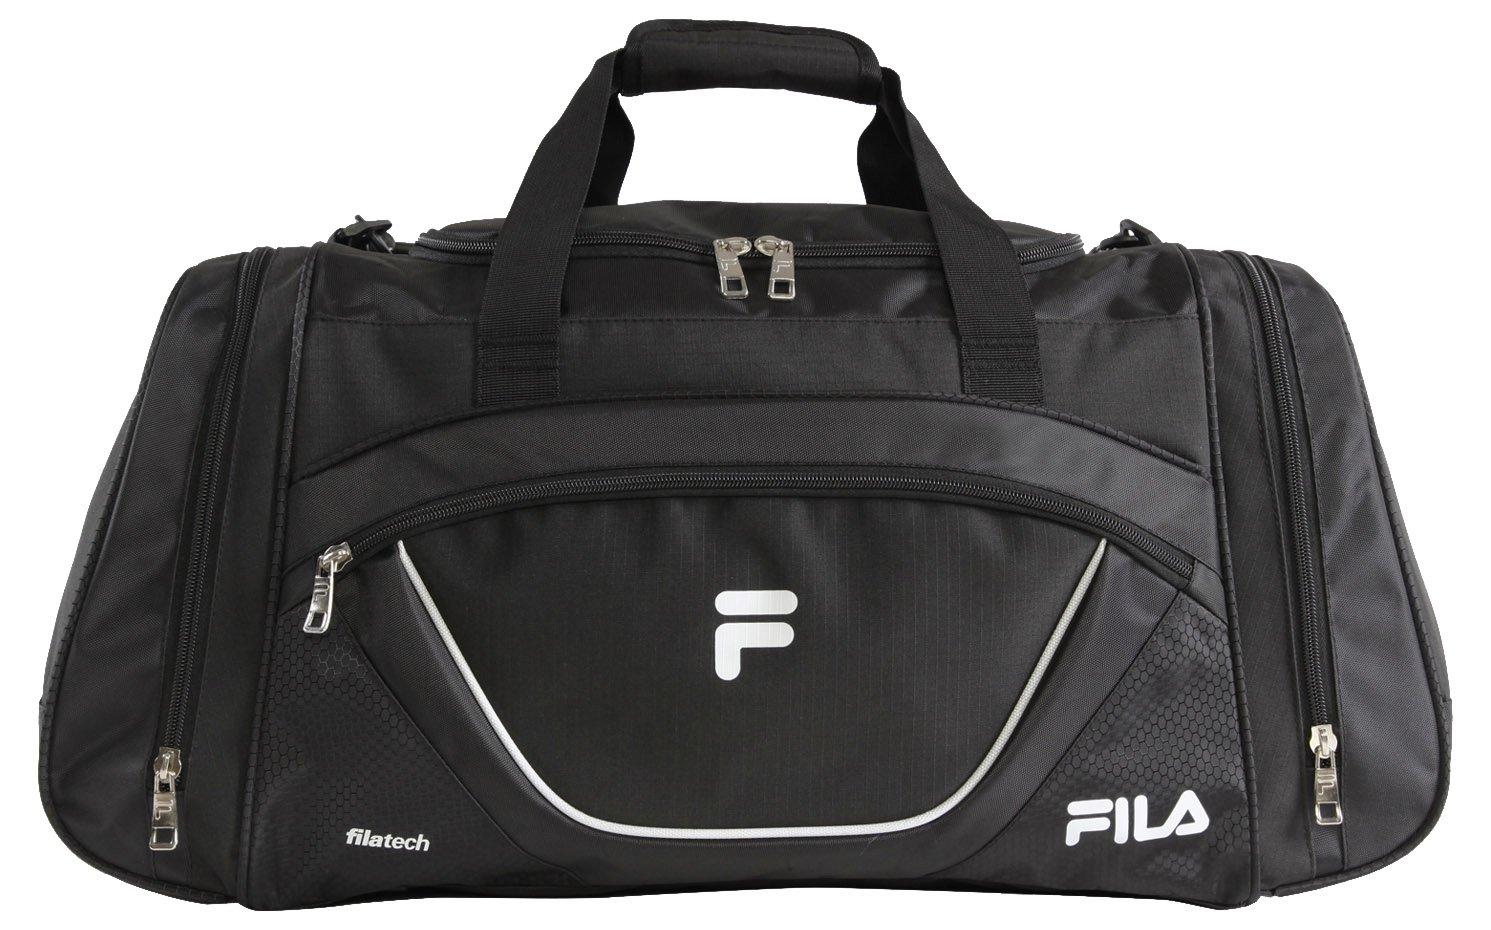 Fila Acer Large Sport Duffel Bag, Black/White, One Size